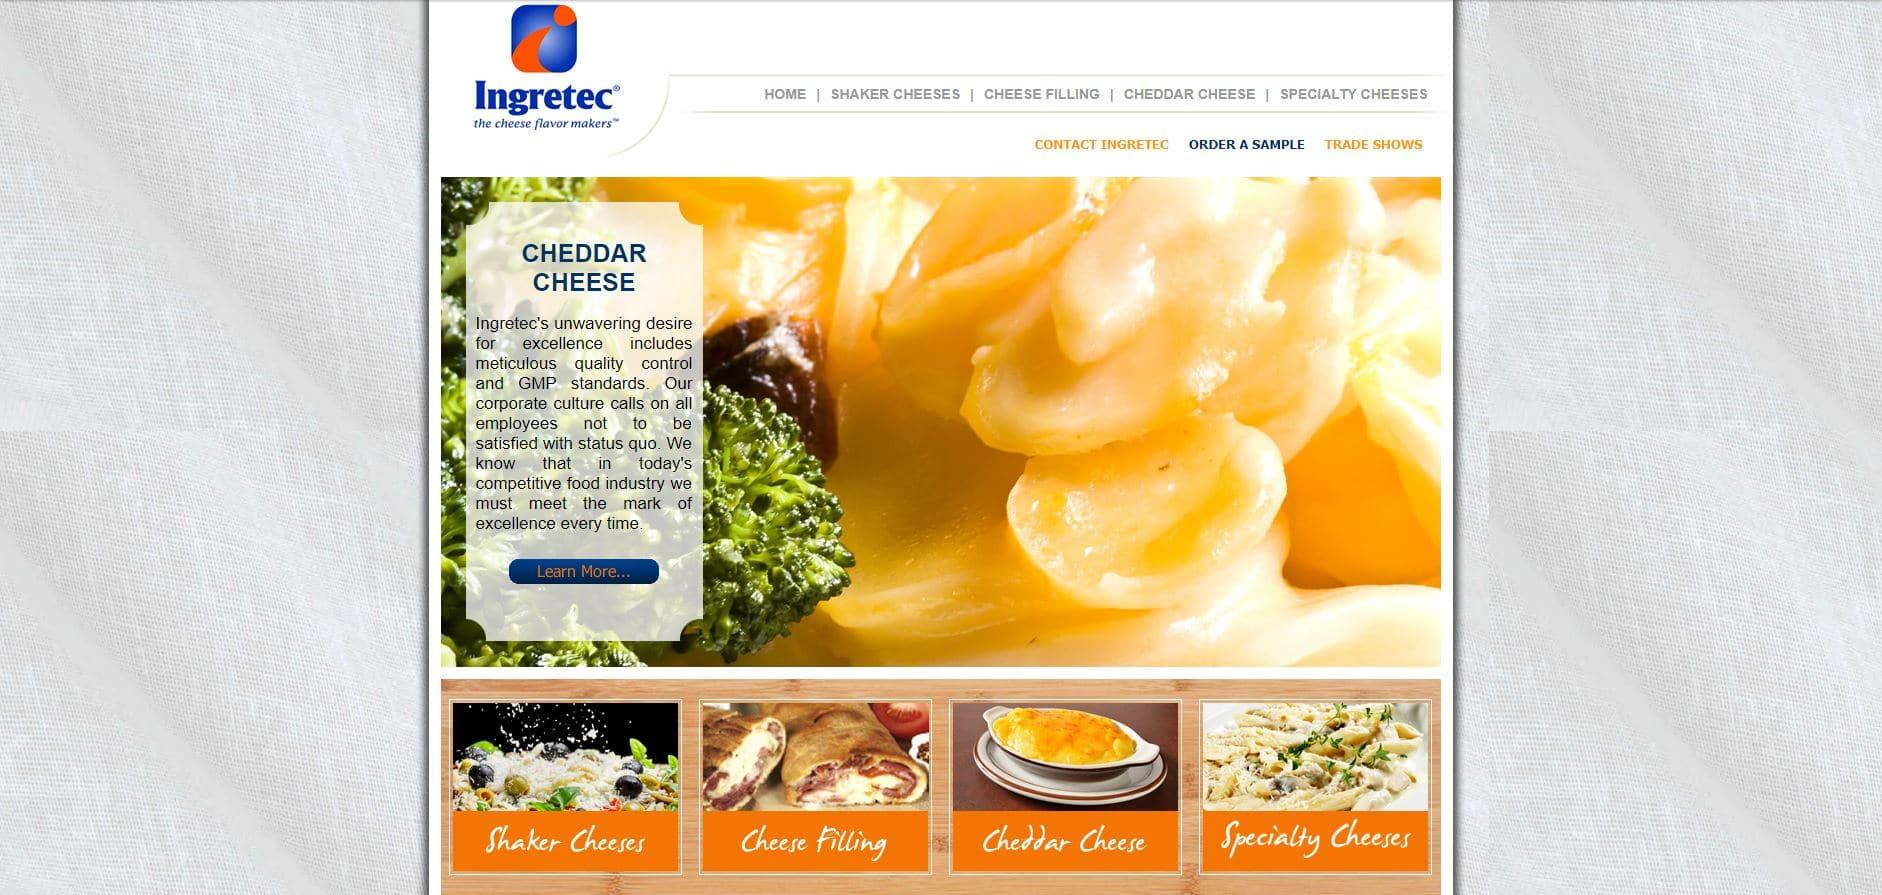 BEFORE WEB DESIGN